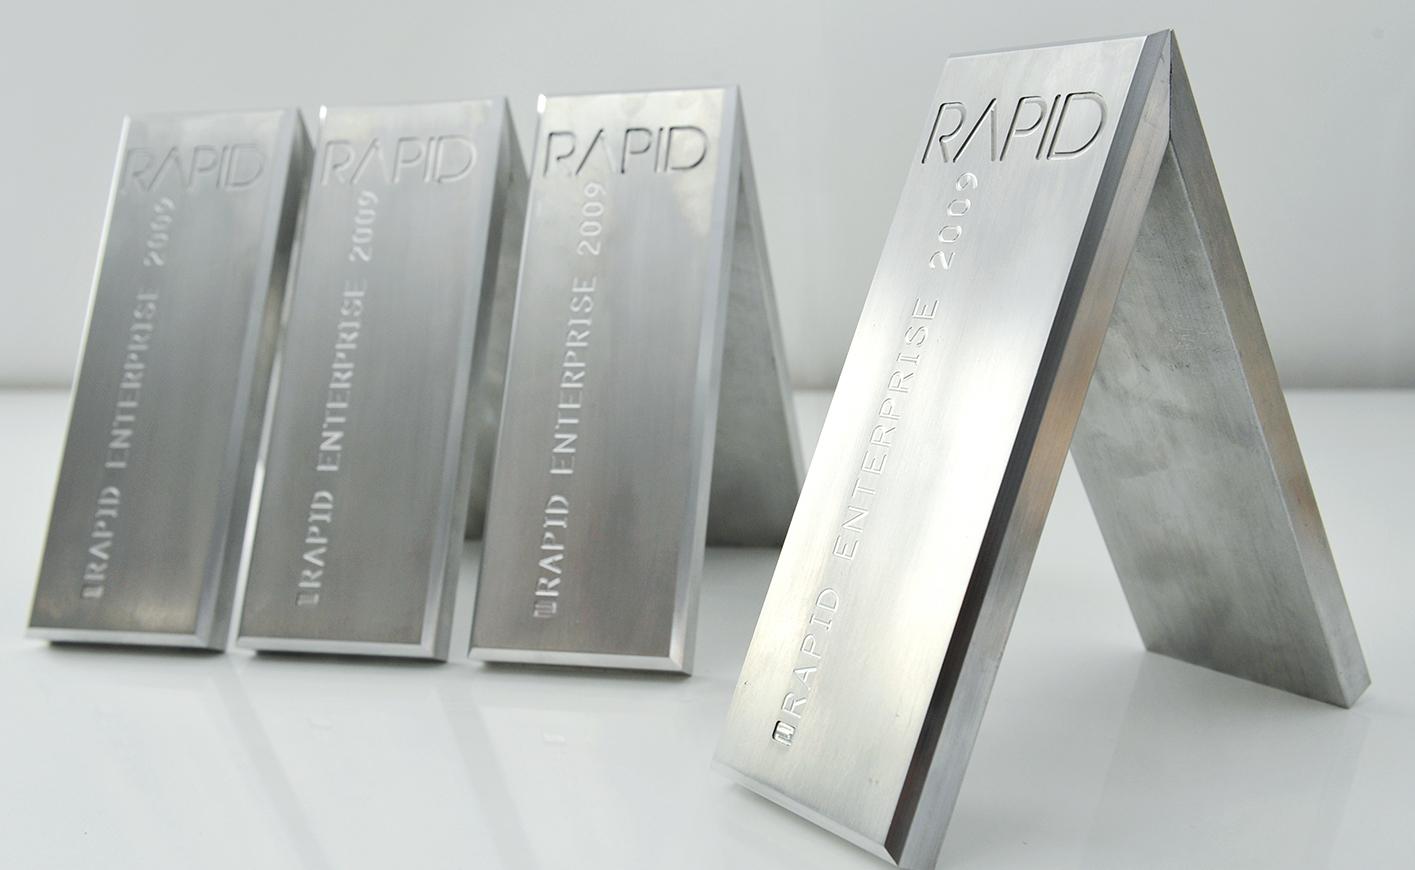 Rapid-trophy